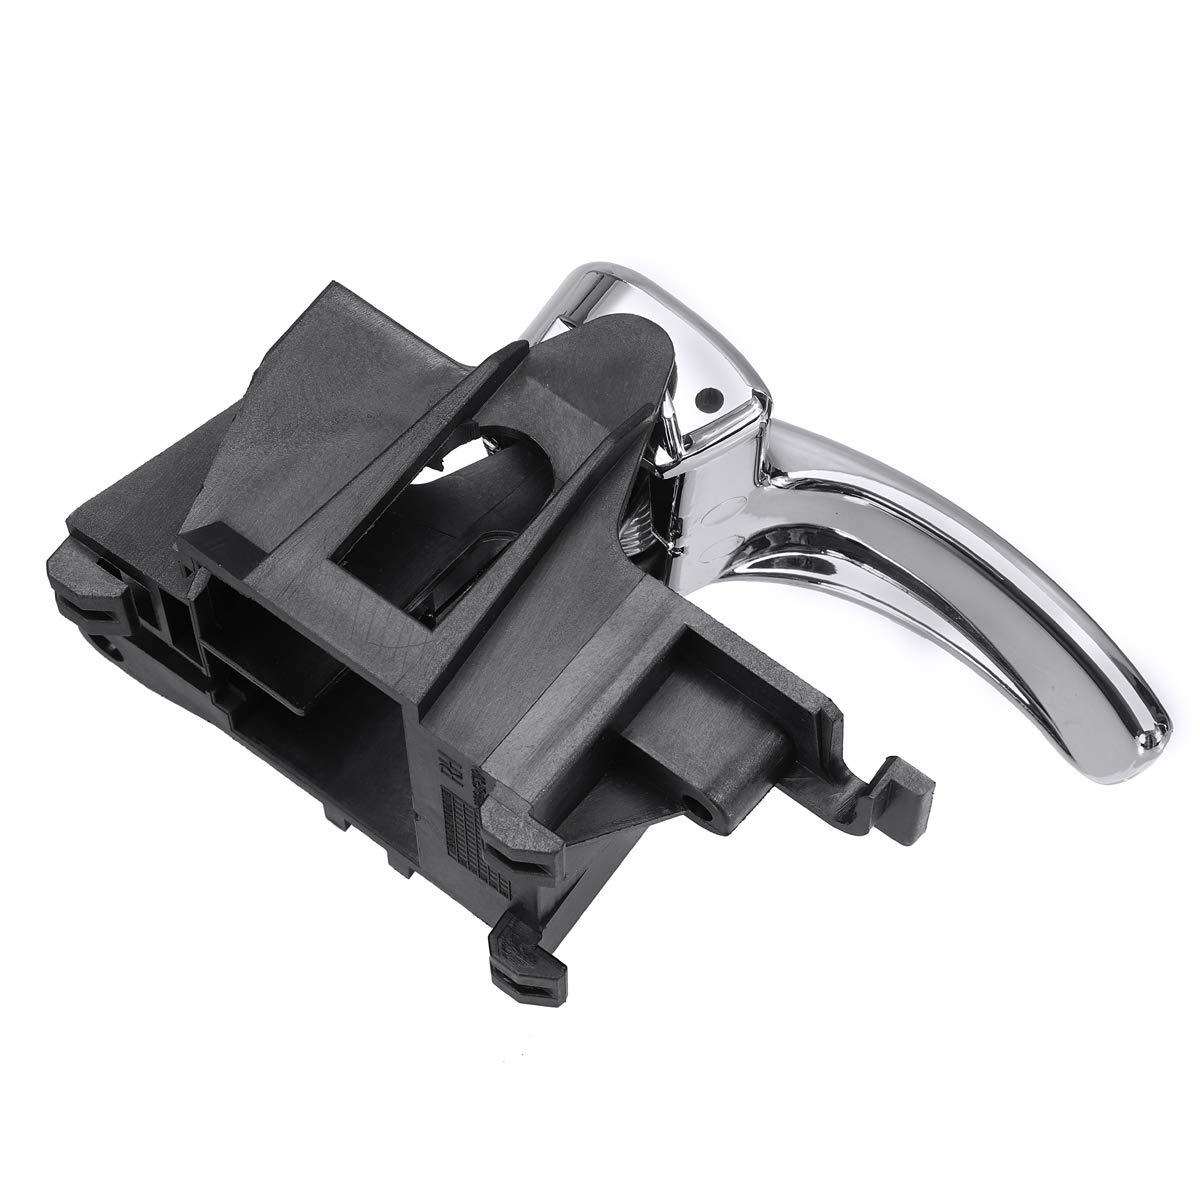 JenNiFer Tiradores De Puerta Interior Izquierdo//Derecho para Nissan Navara D40 Ute//Pathfinder R51 05-13 Izquierda